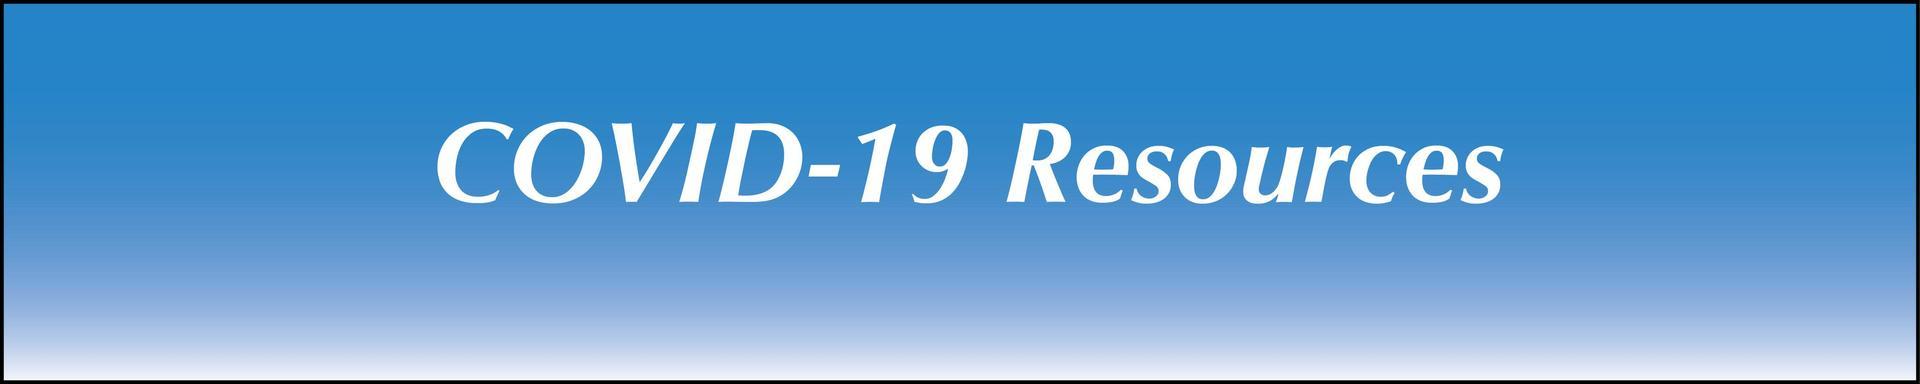 COVID-19 Resources graphic